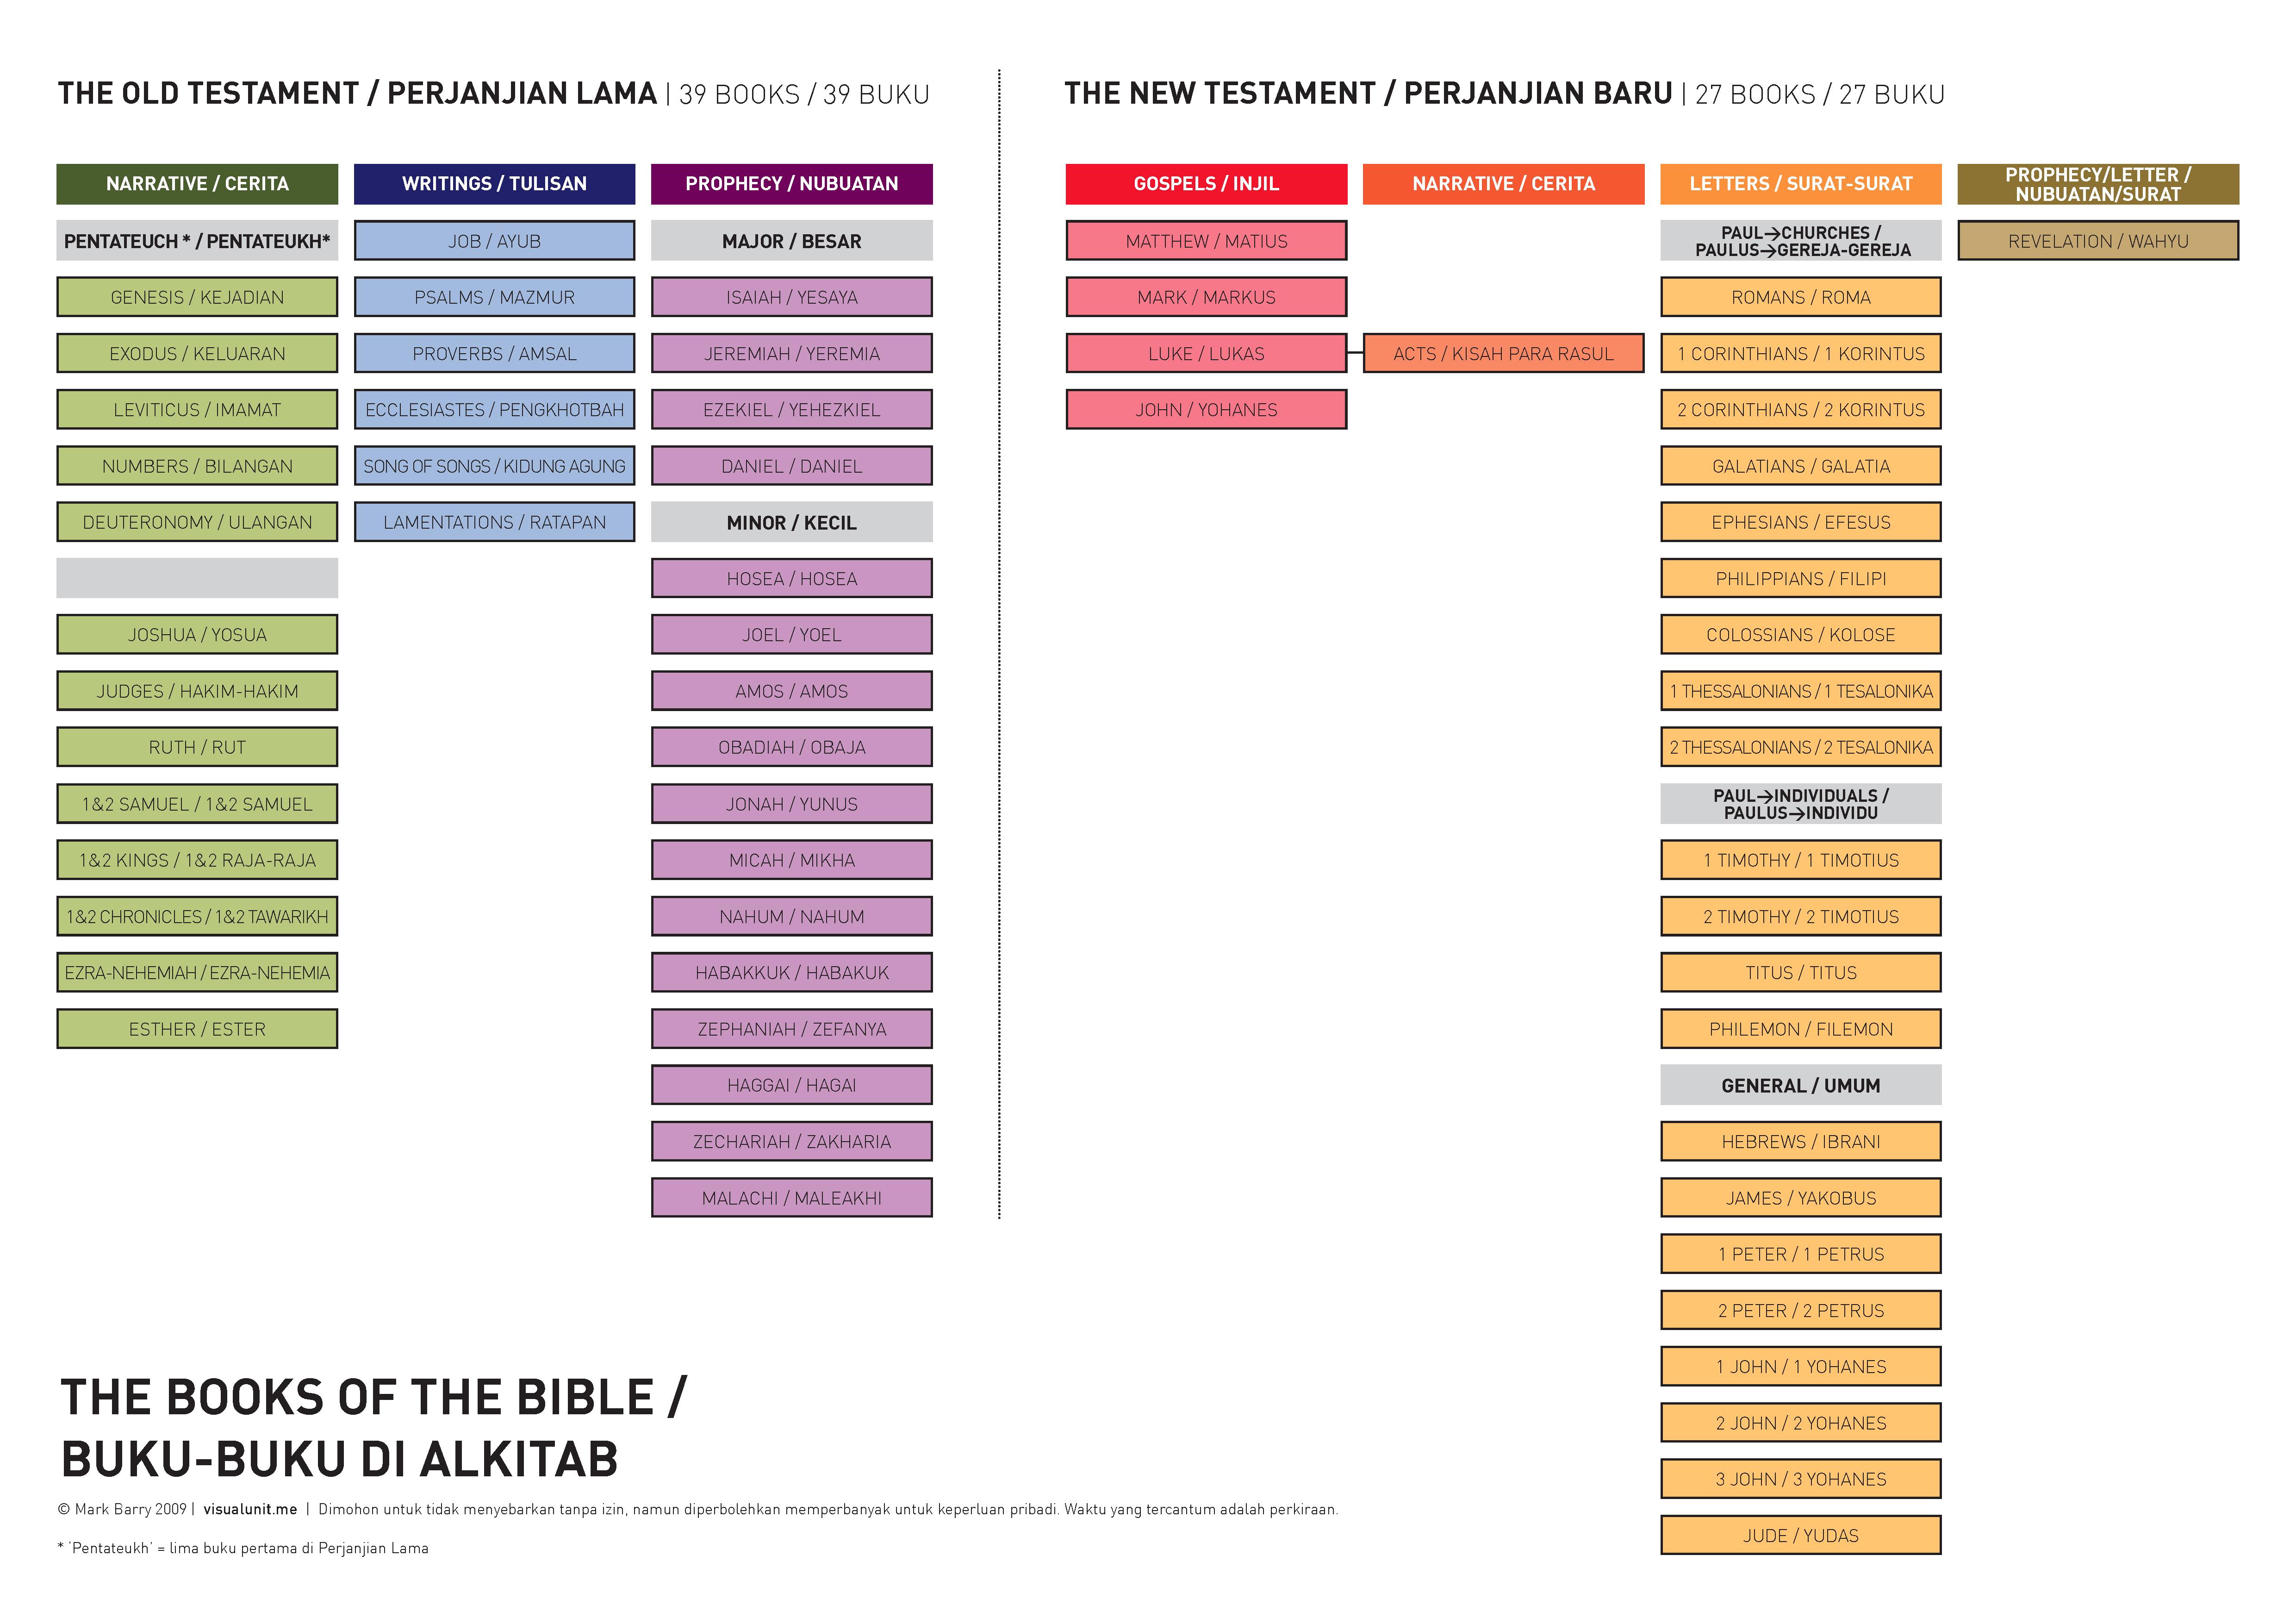 Buku-Buku Di Alkitab (Indonesian & English Books of the